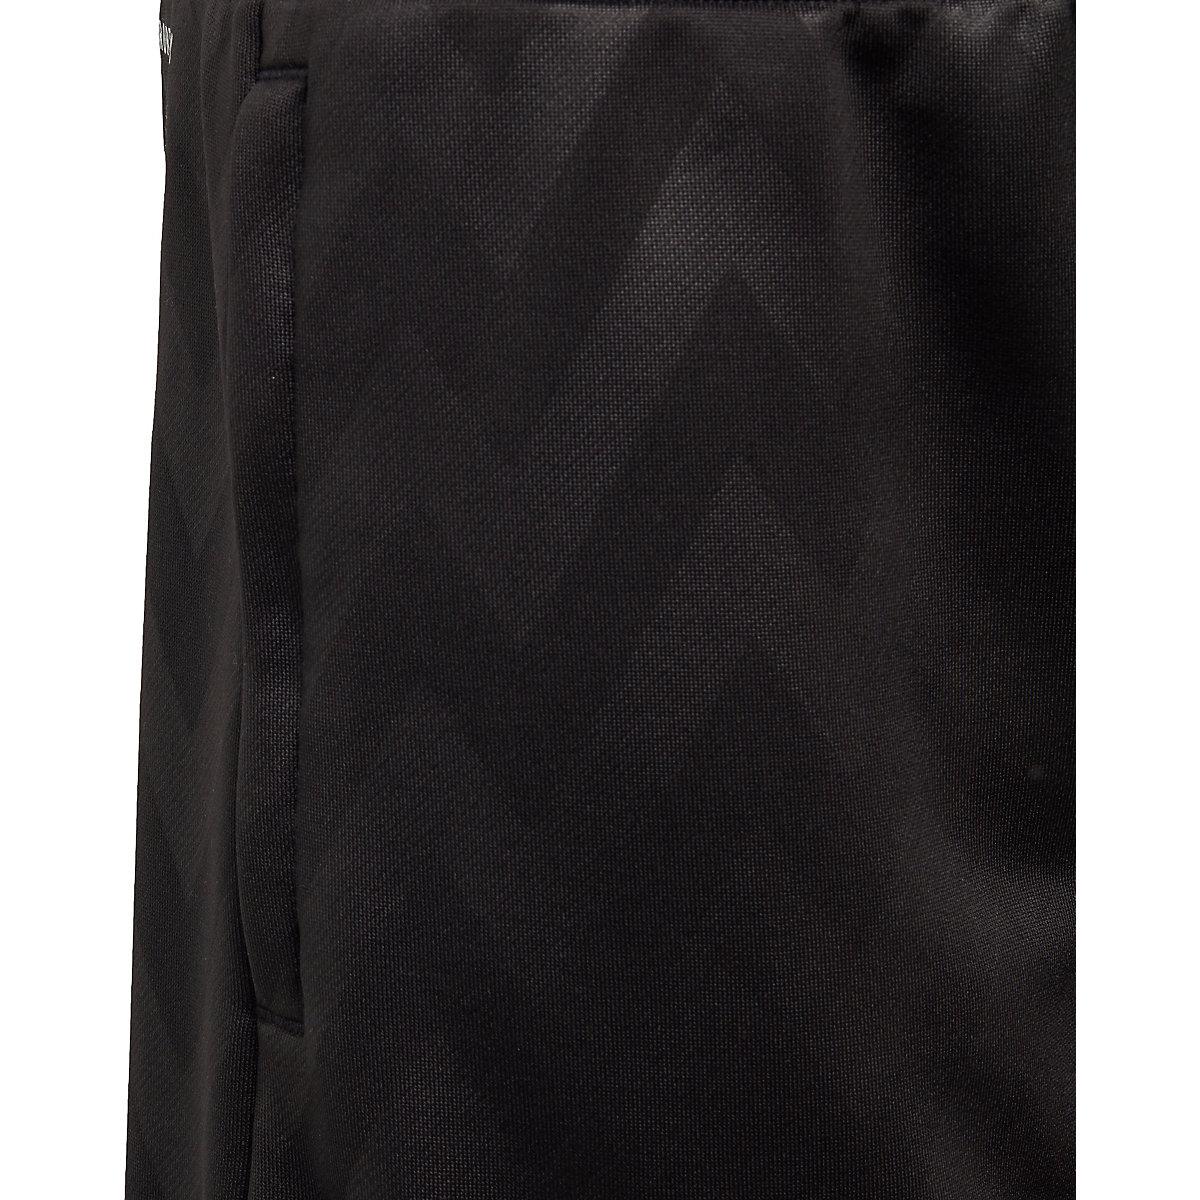 Shorts TR XFG SH für Jungen adidas Performance buVj9